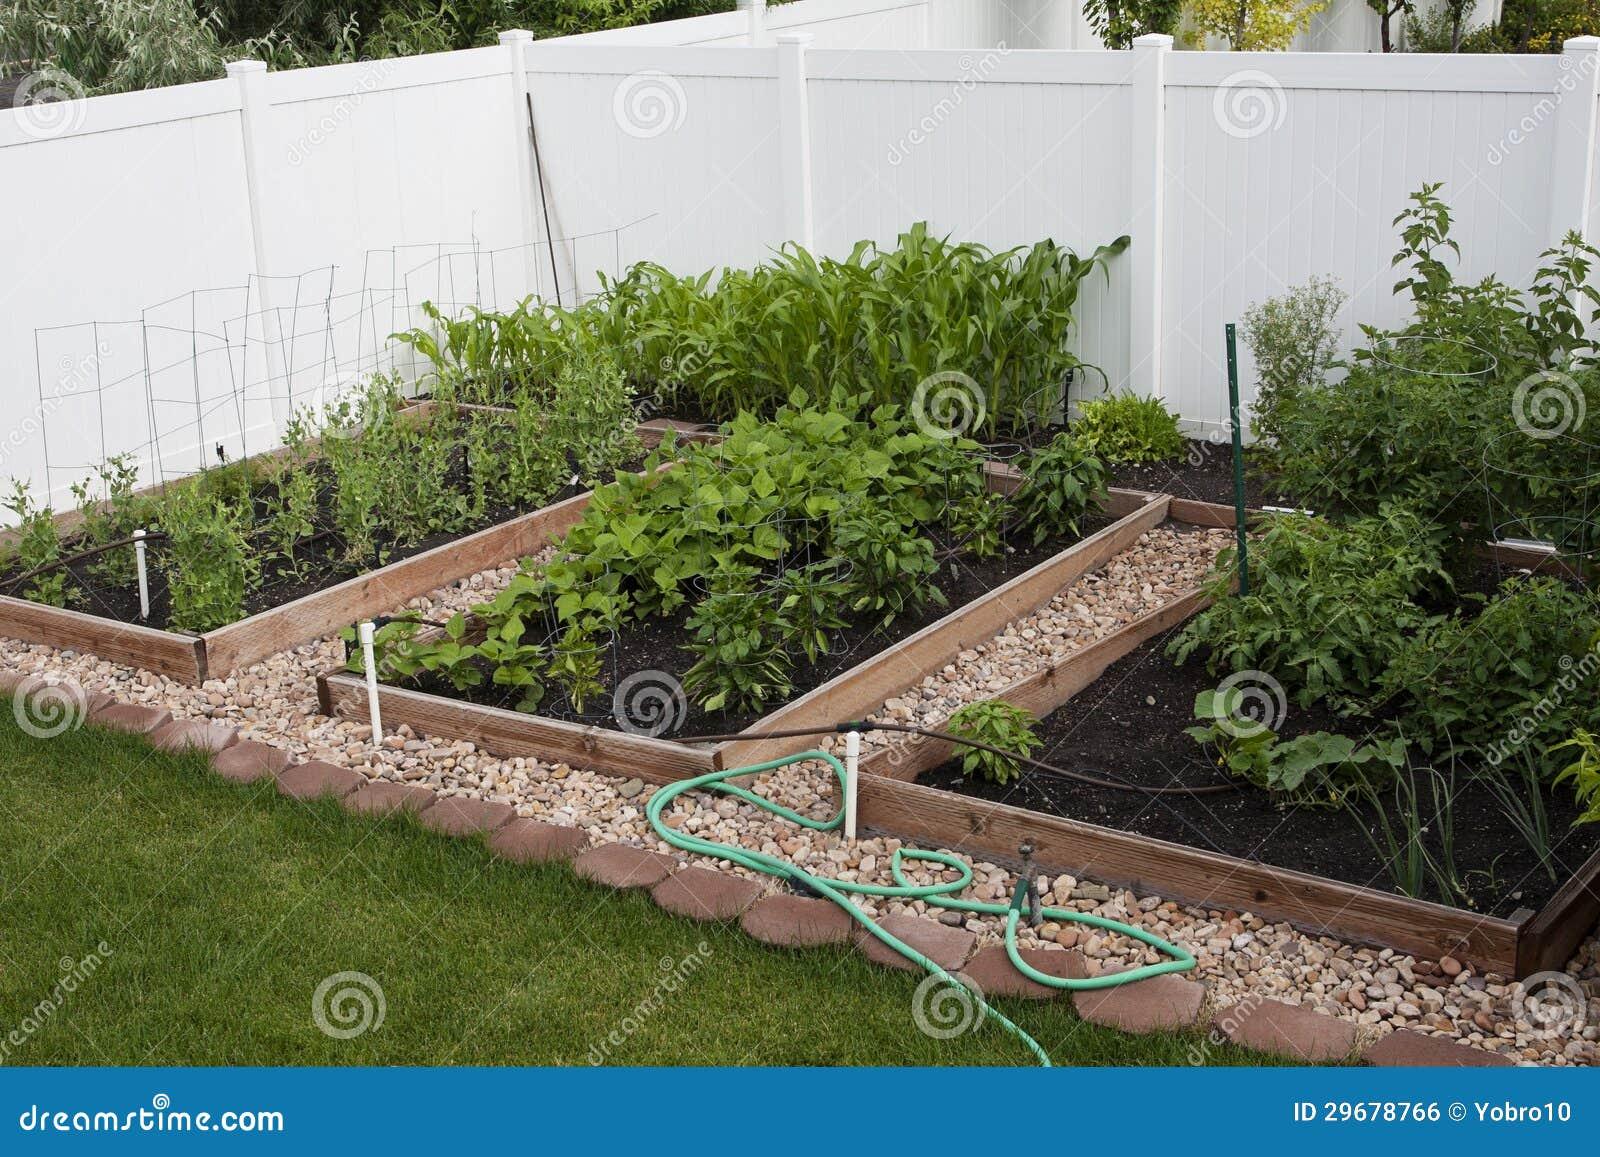 Backyard Vegetable Garden Business : Backyard Organic Vegetable Garden Royalty Free Stock Image  Image